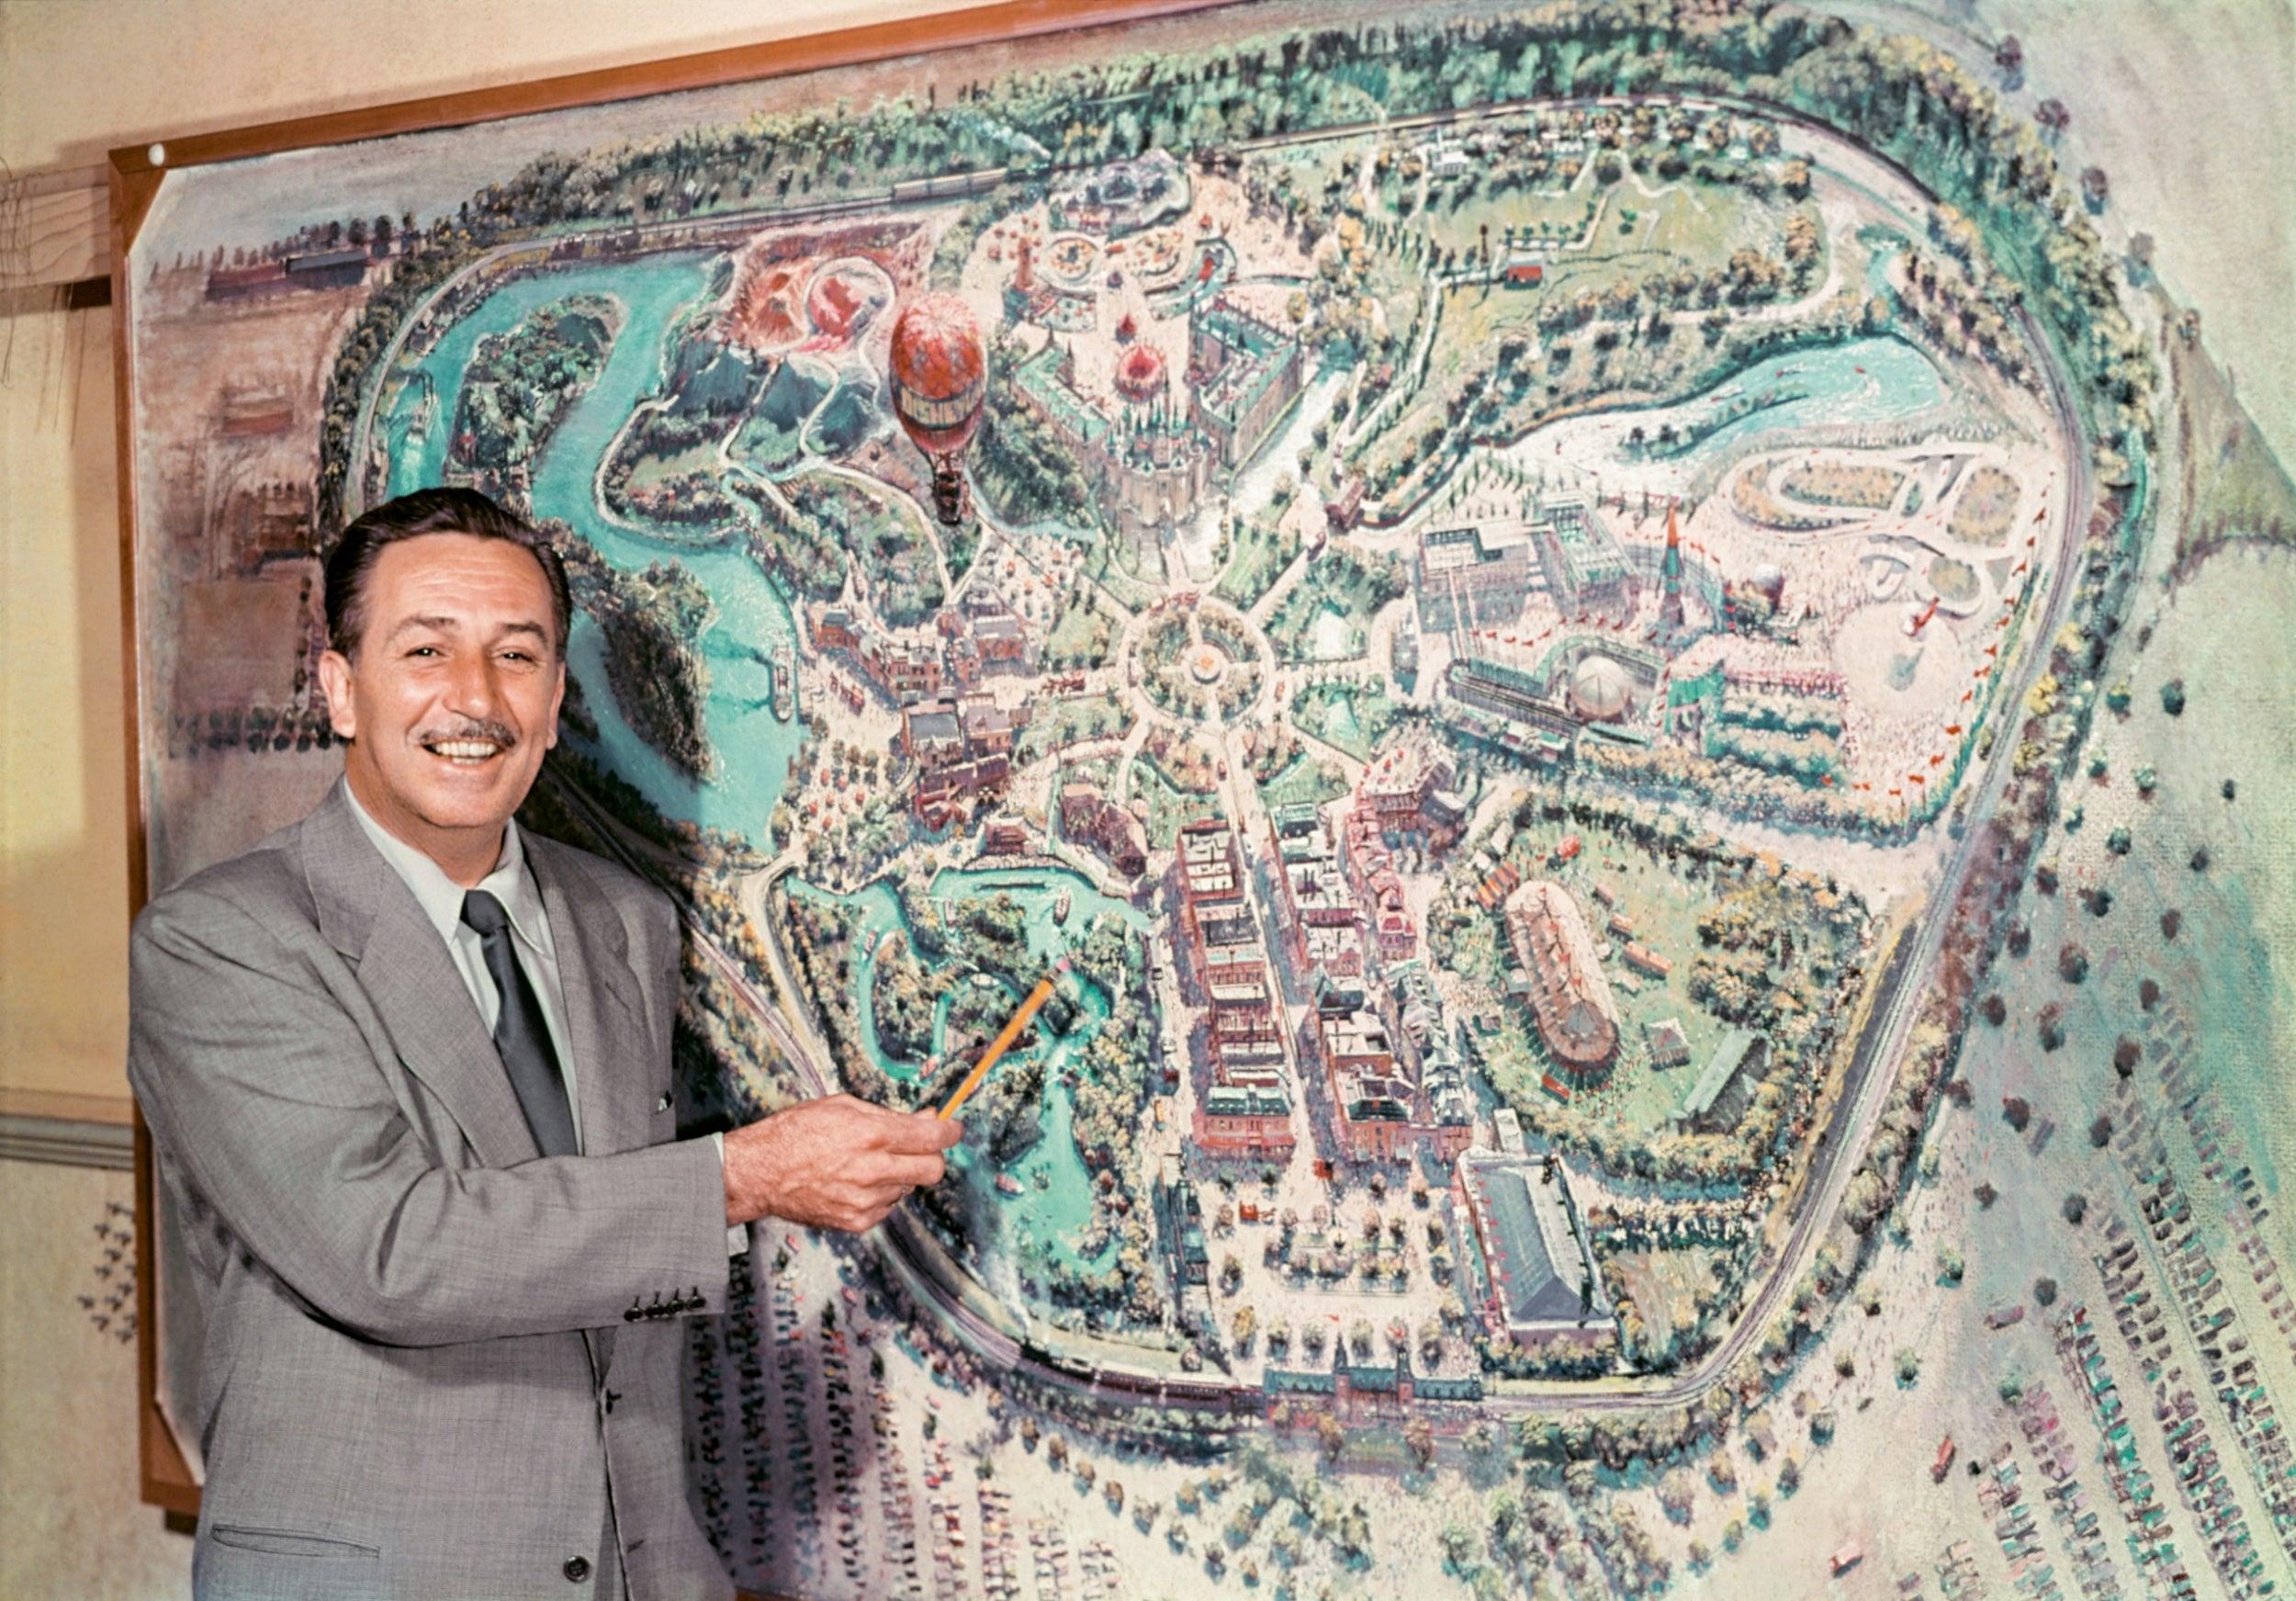 Hook up Disneyland